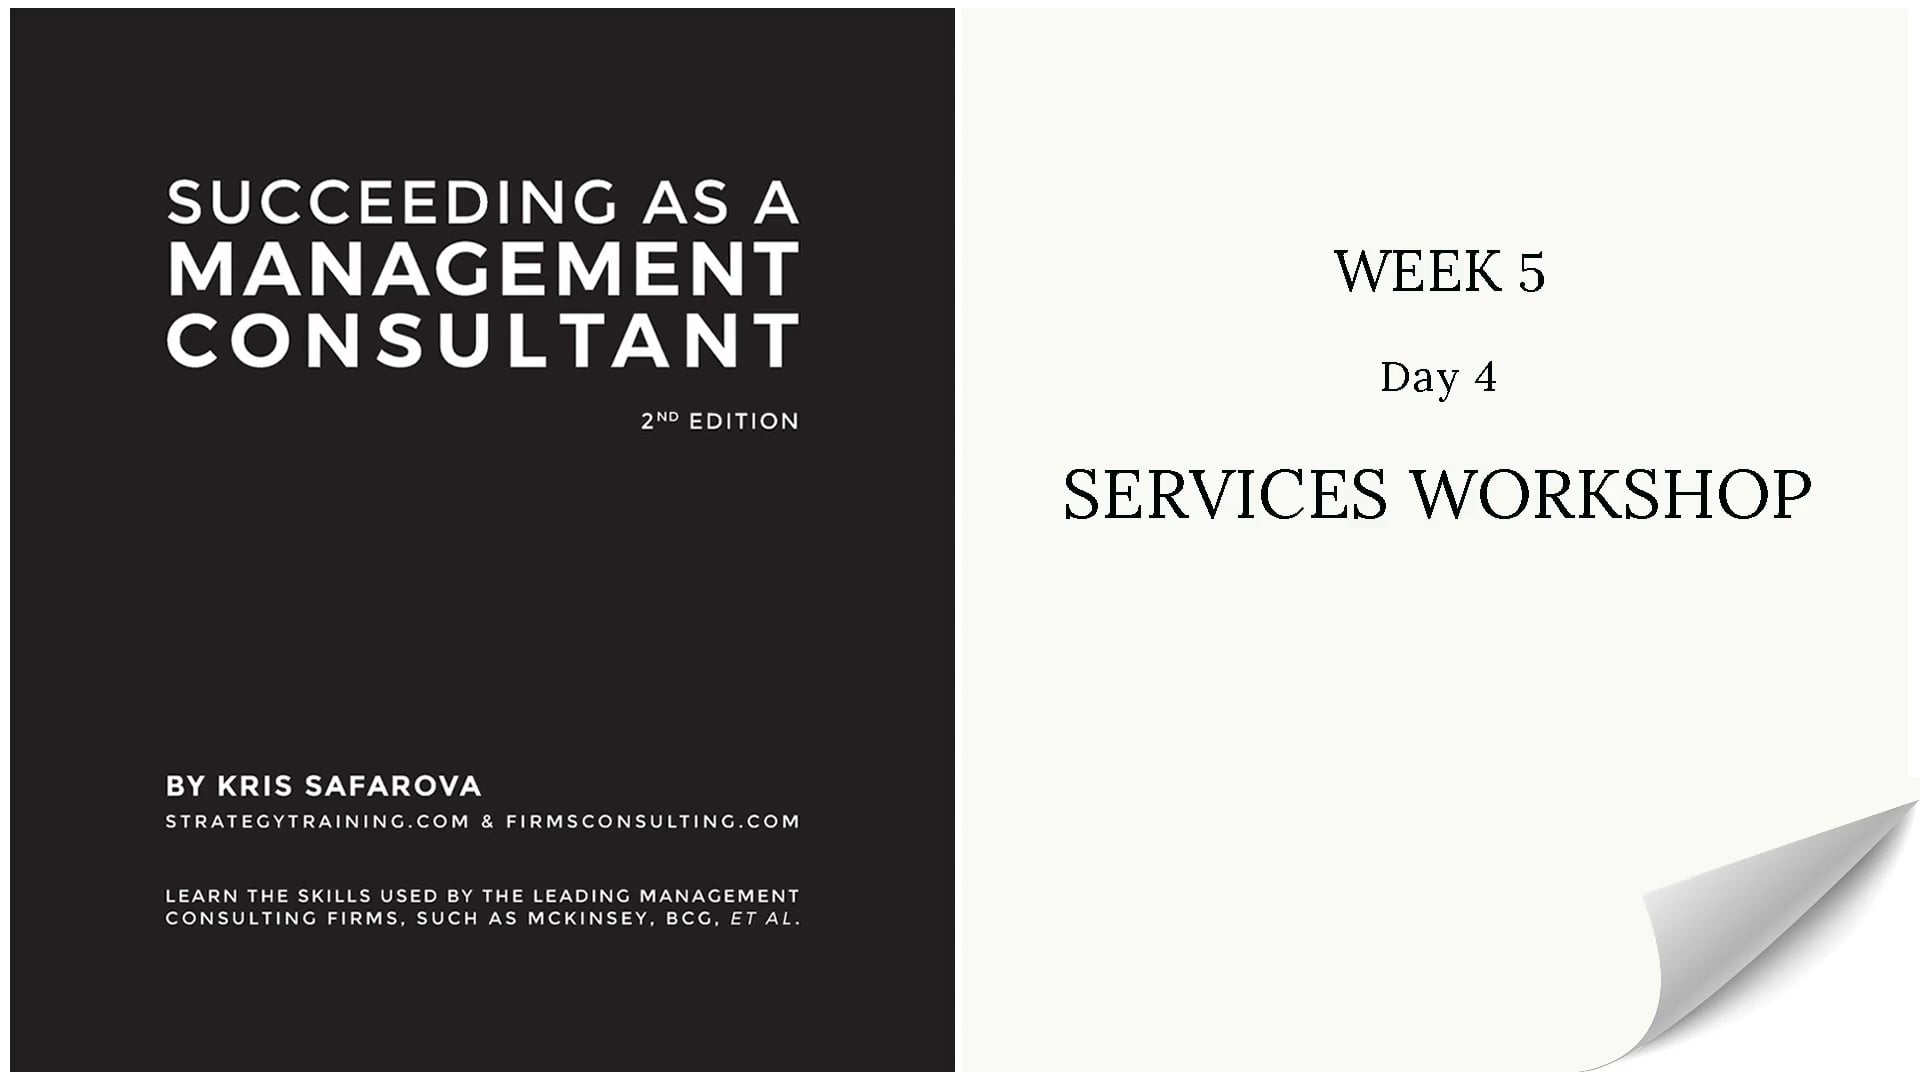 031 SAAMC Week 5 - Day 4 Services Wor...